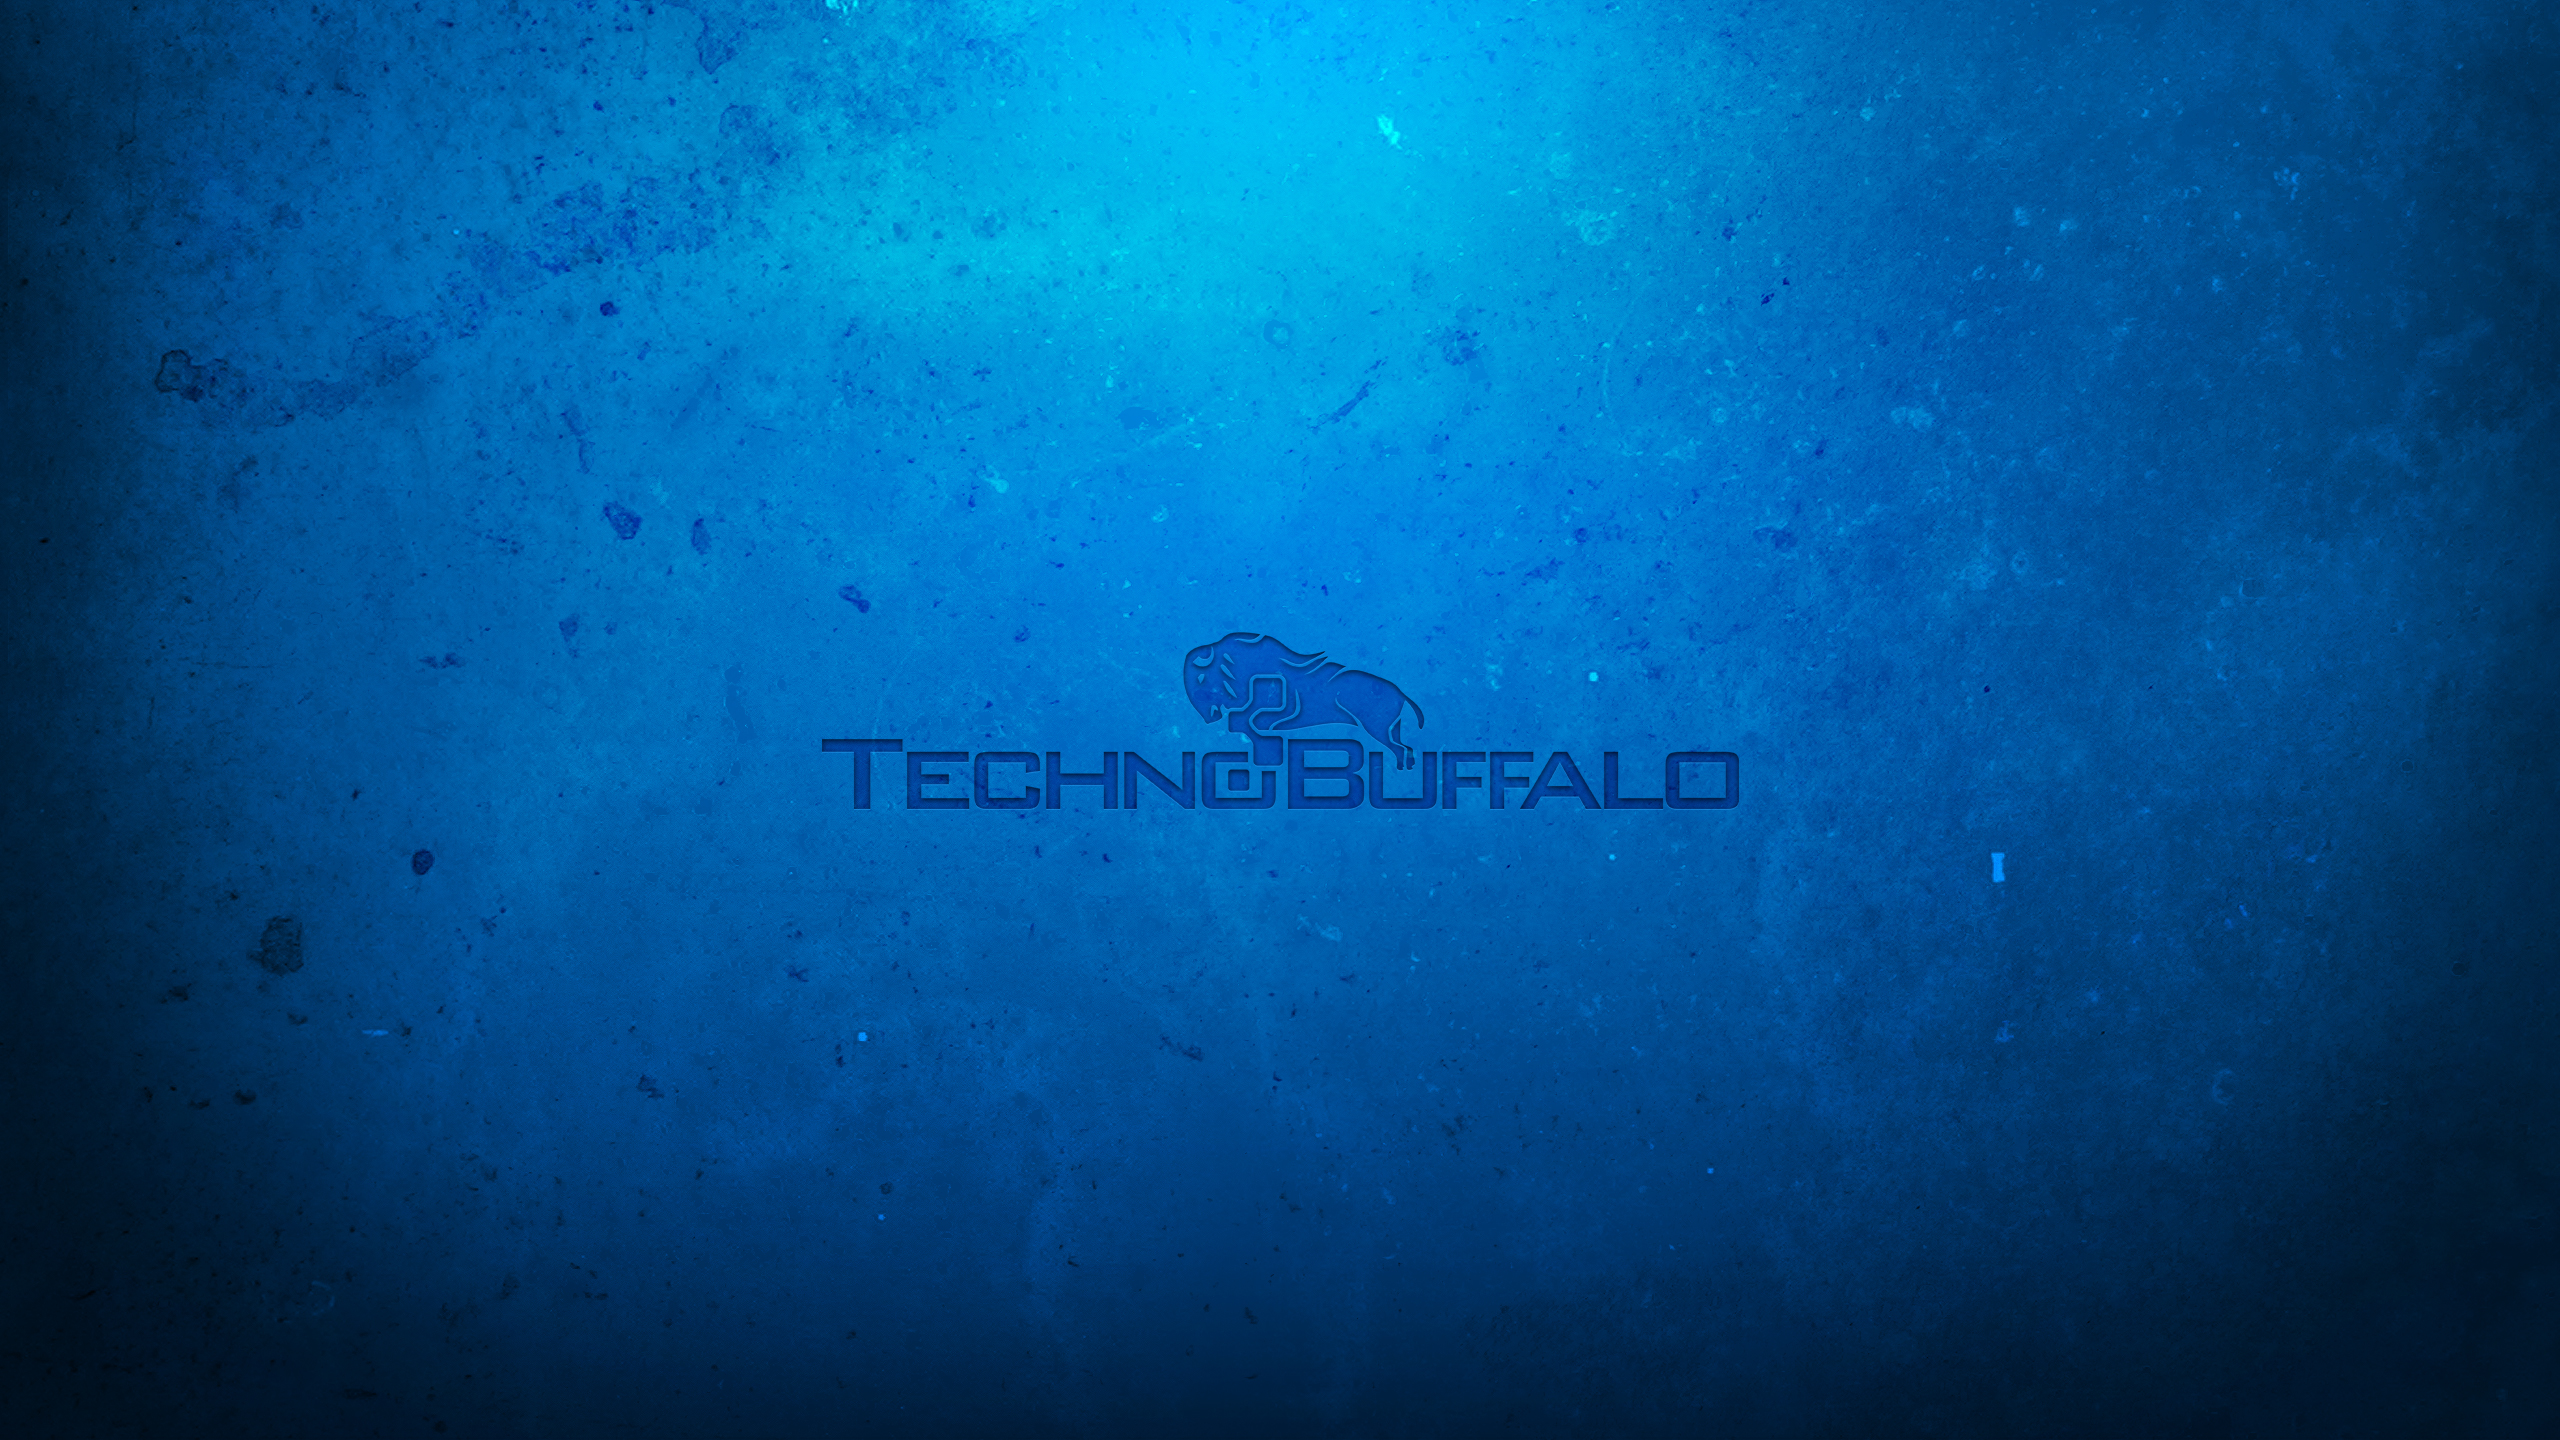 wallpaper technobuffalo blue wallpaper technobuffalo glow wallpaper 2560x1440